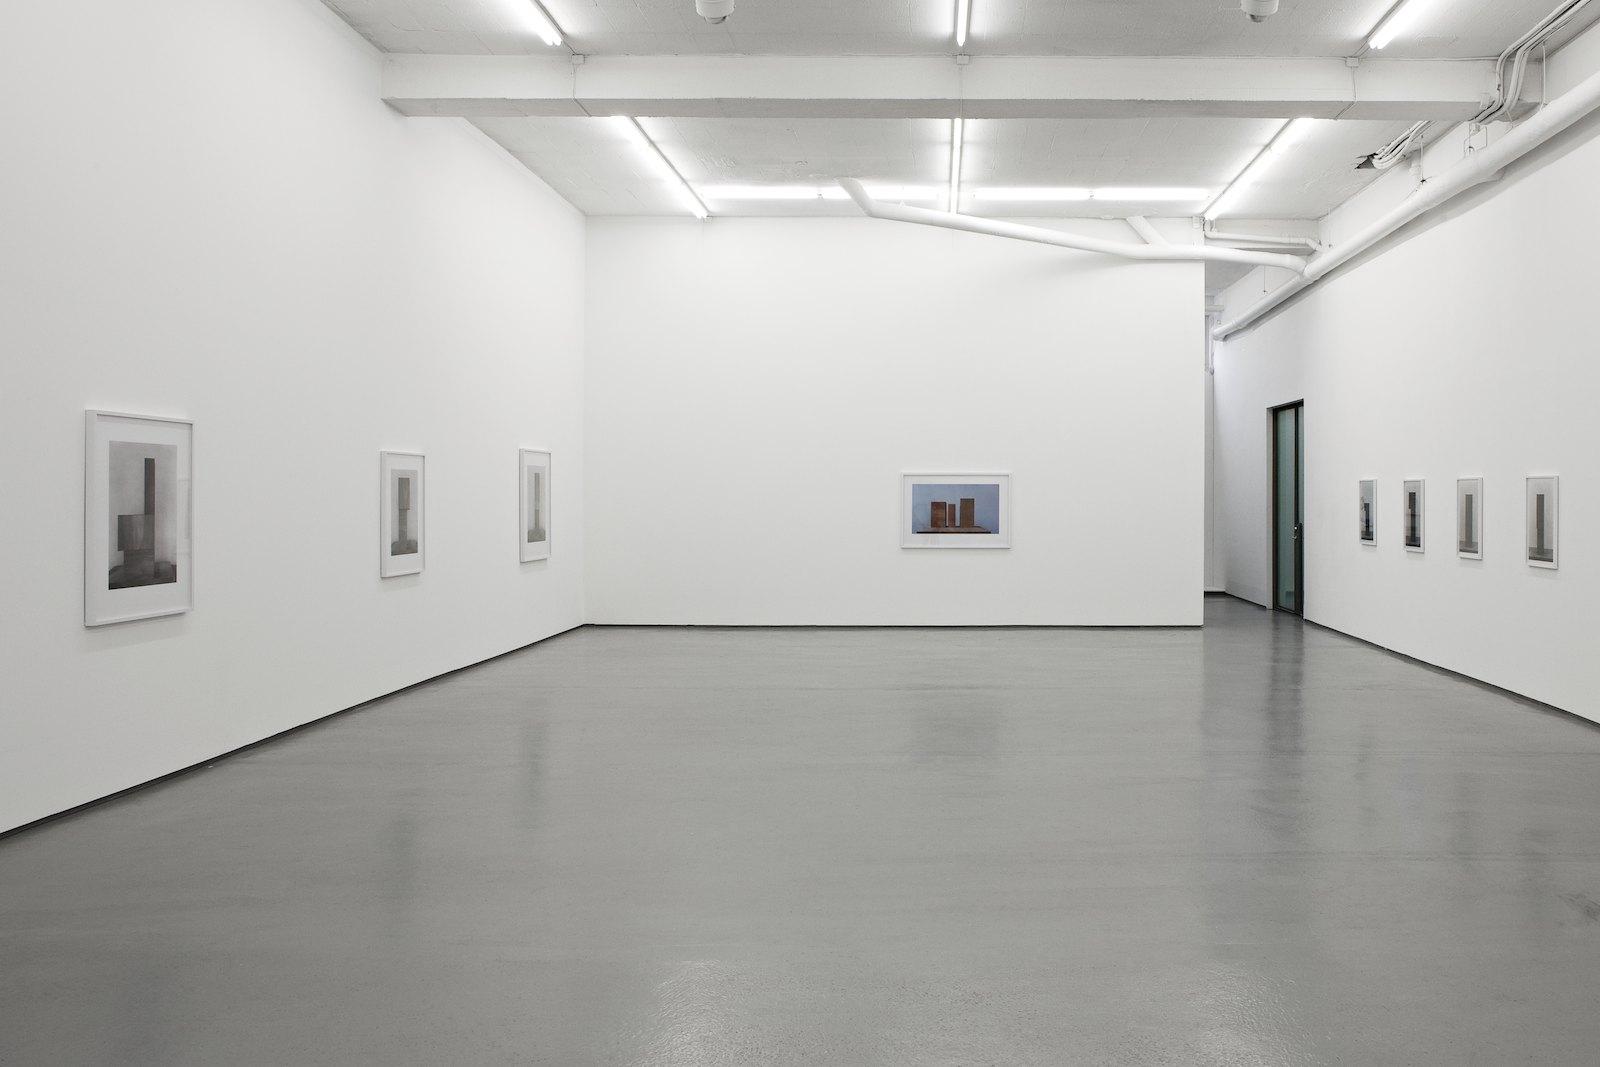 Installation view, Stein Rønning, Sett, Galleri Riis, Oslo, 2009